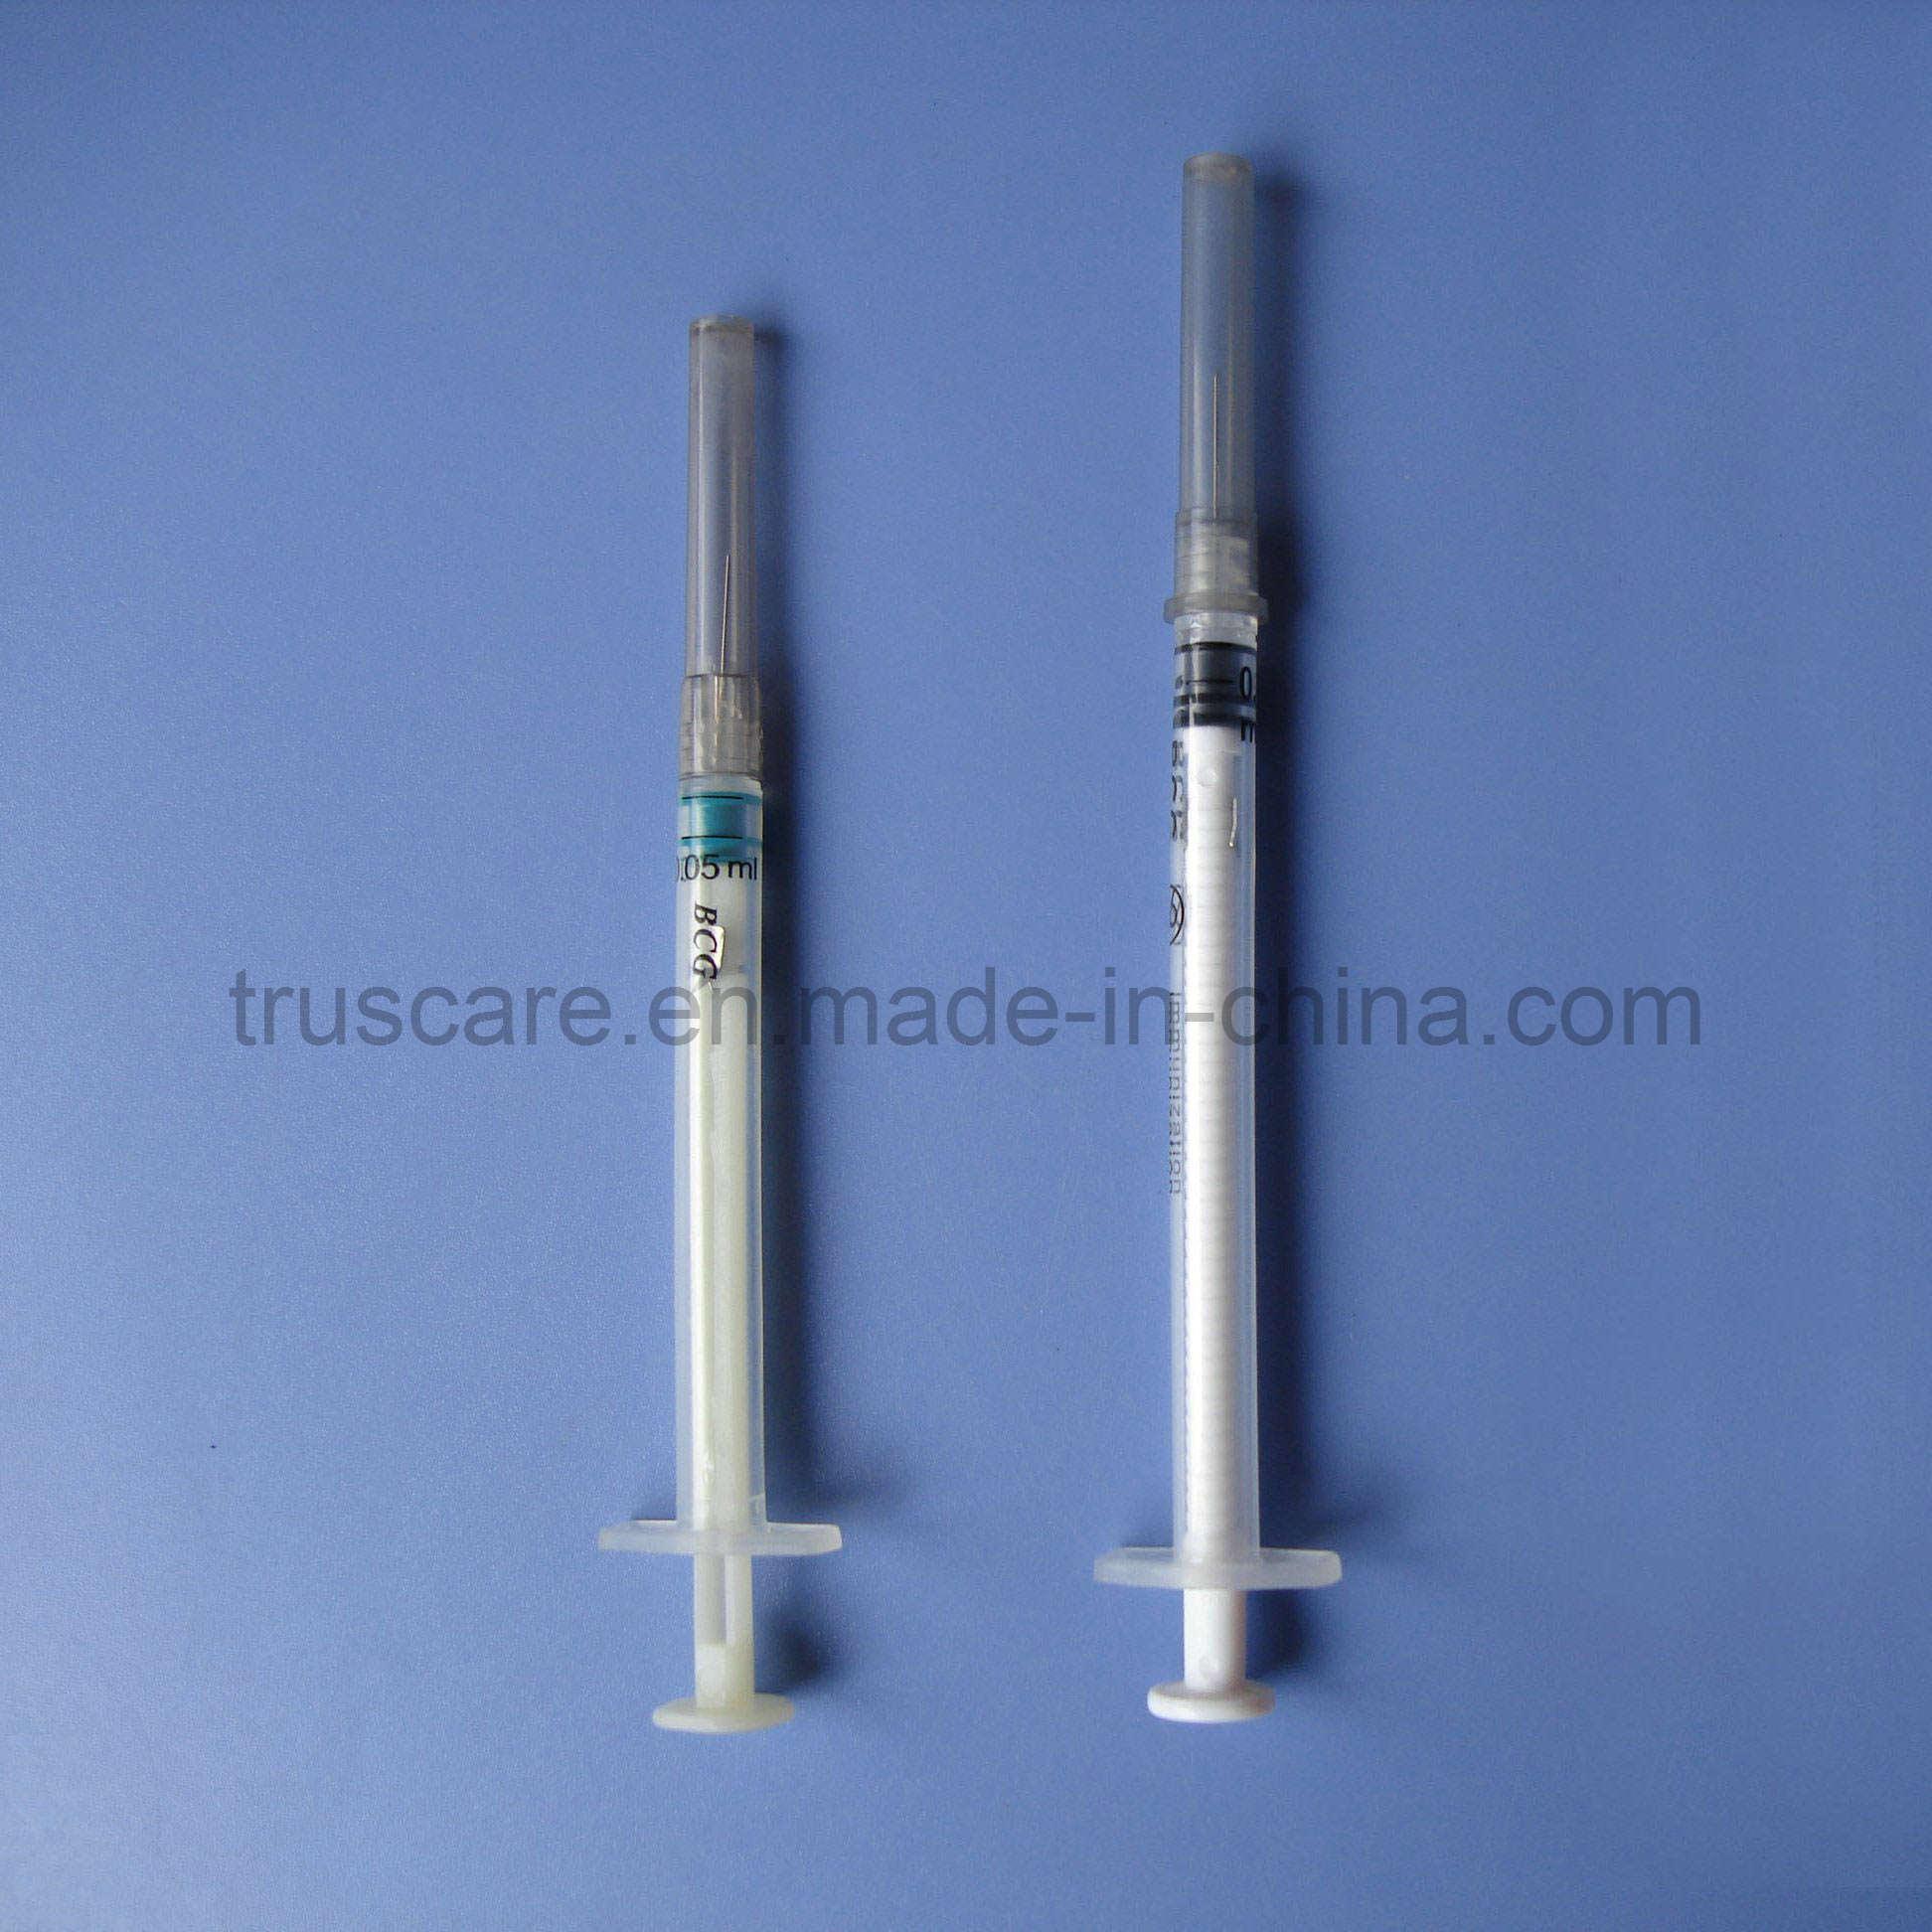 Vaccine Syringe (tuberculin syringe, BCG syringe)